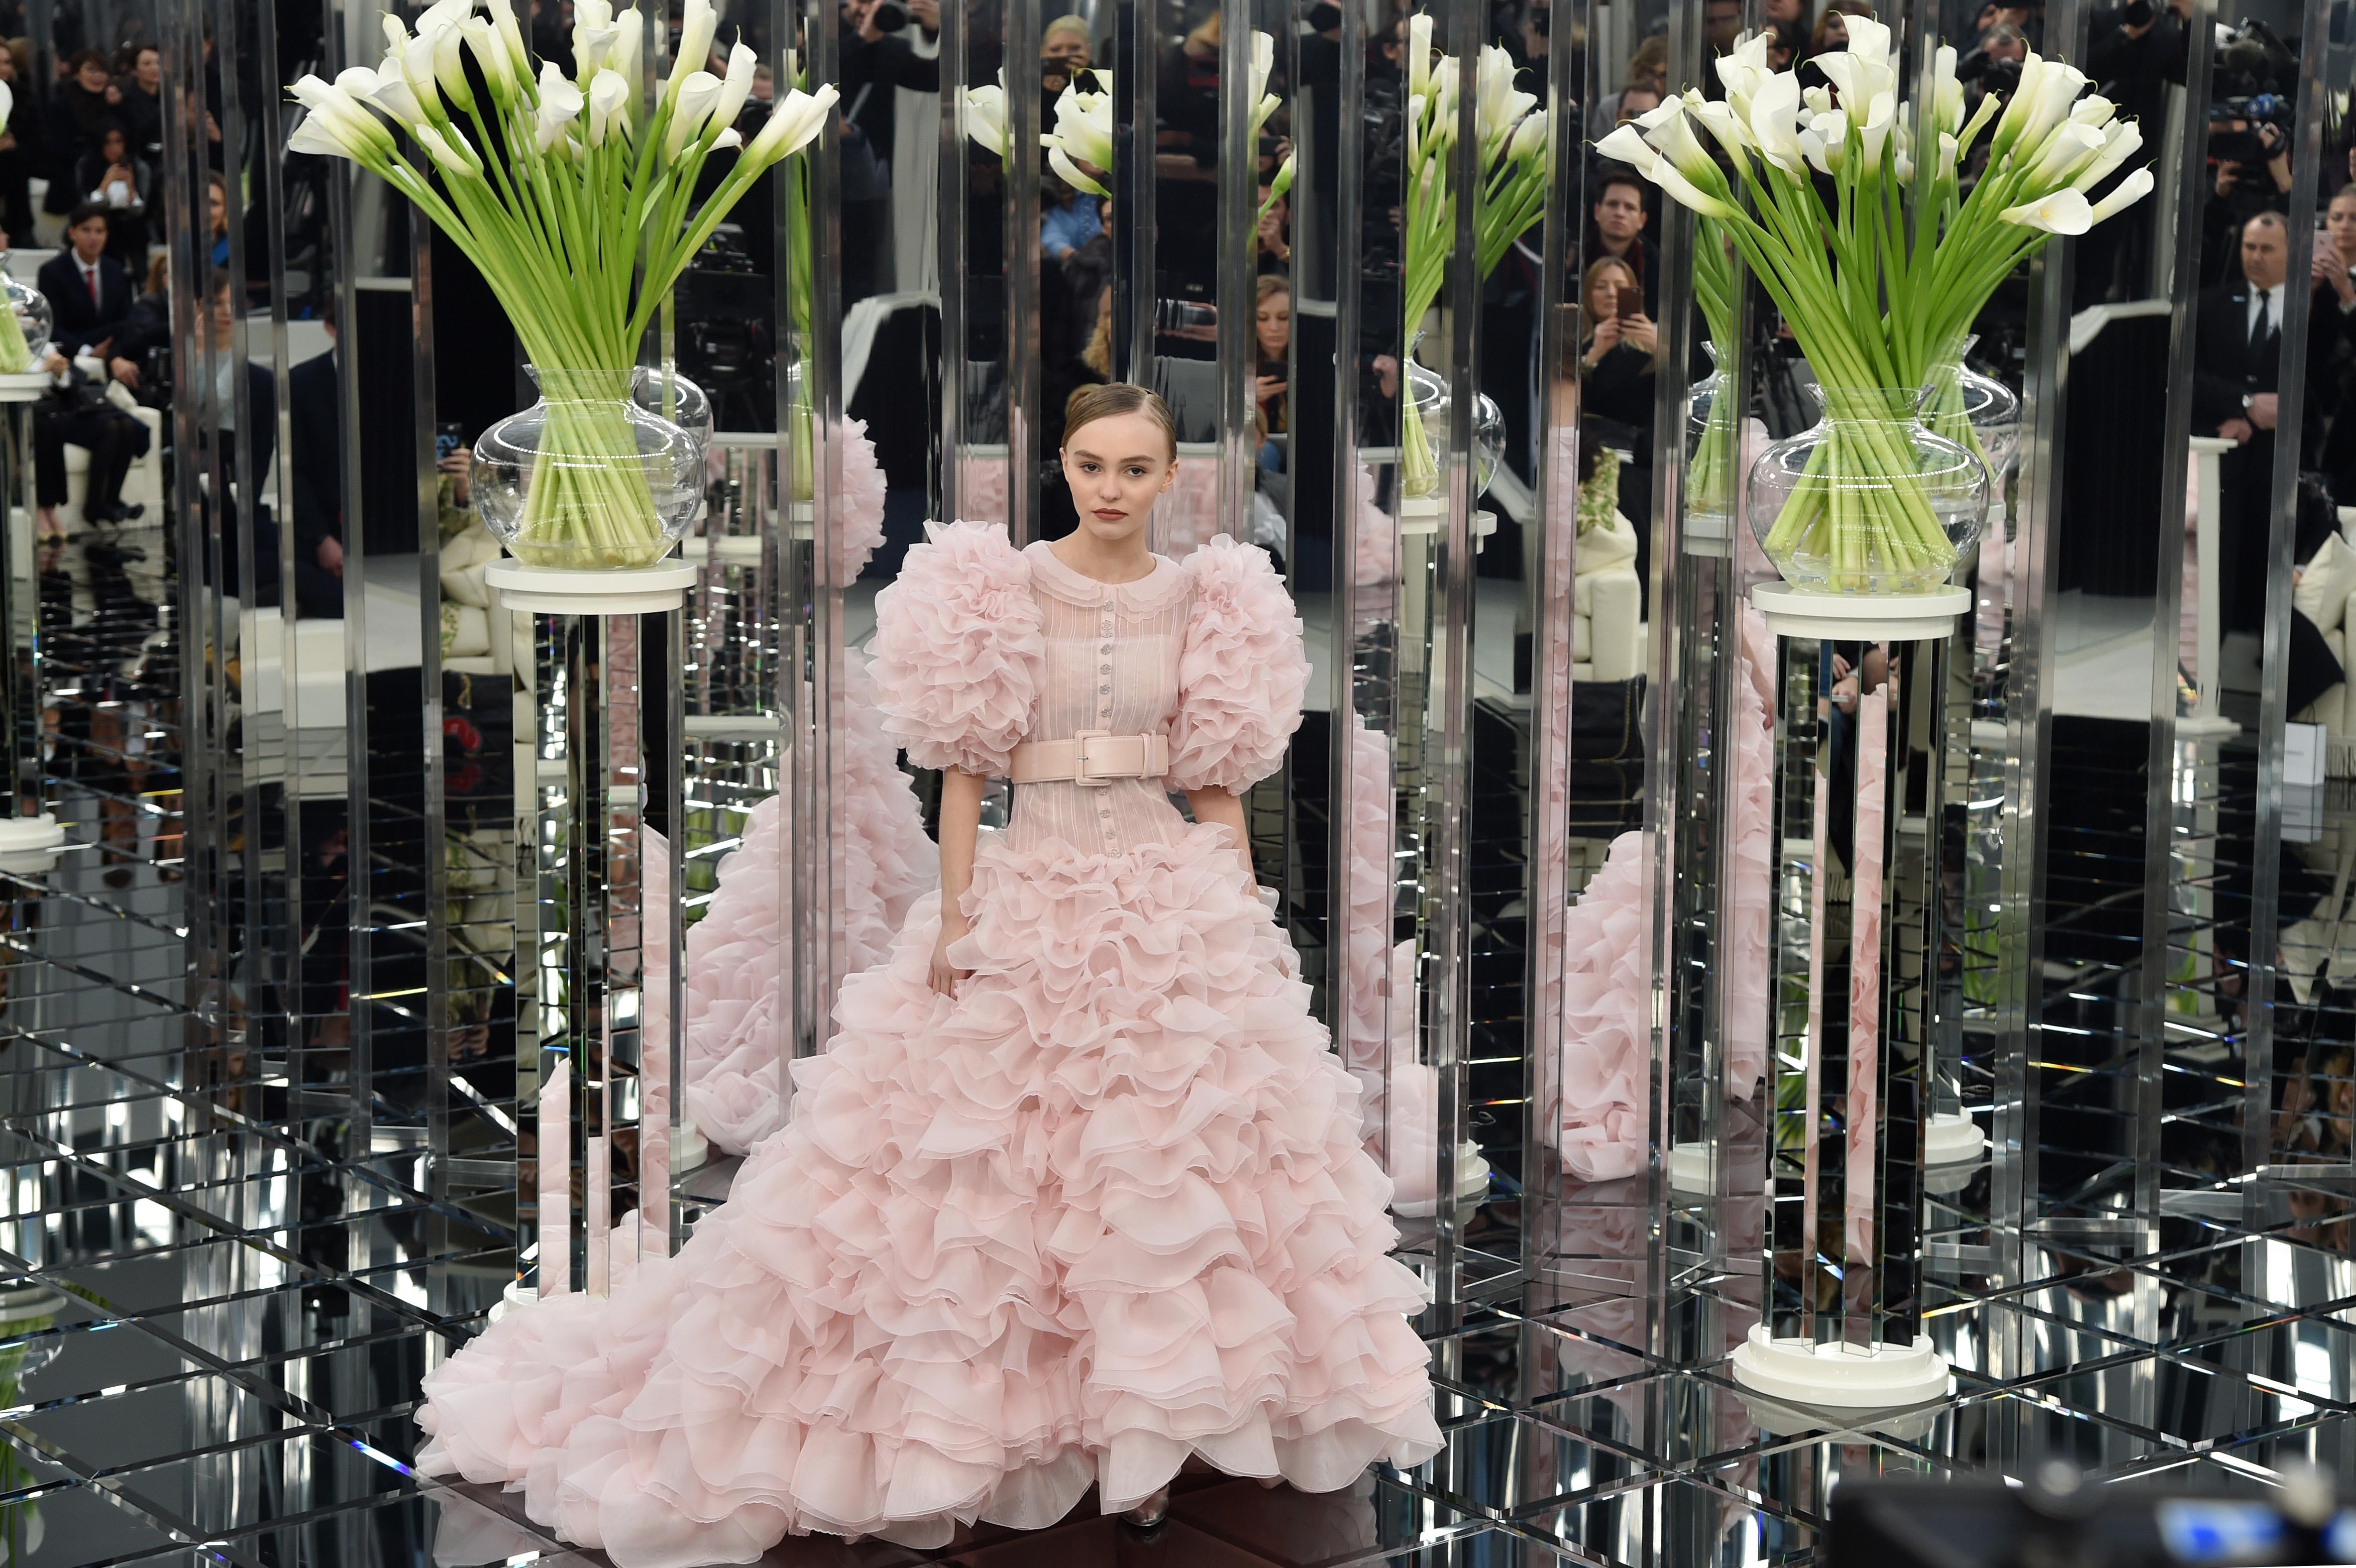 Лили Роуз Депп на показе Chanel в Париже